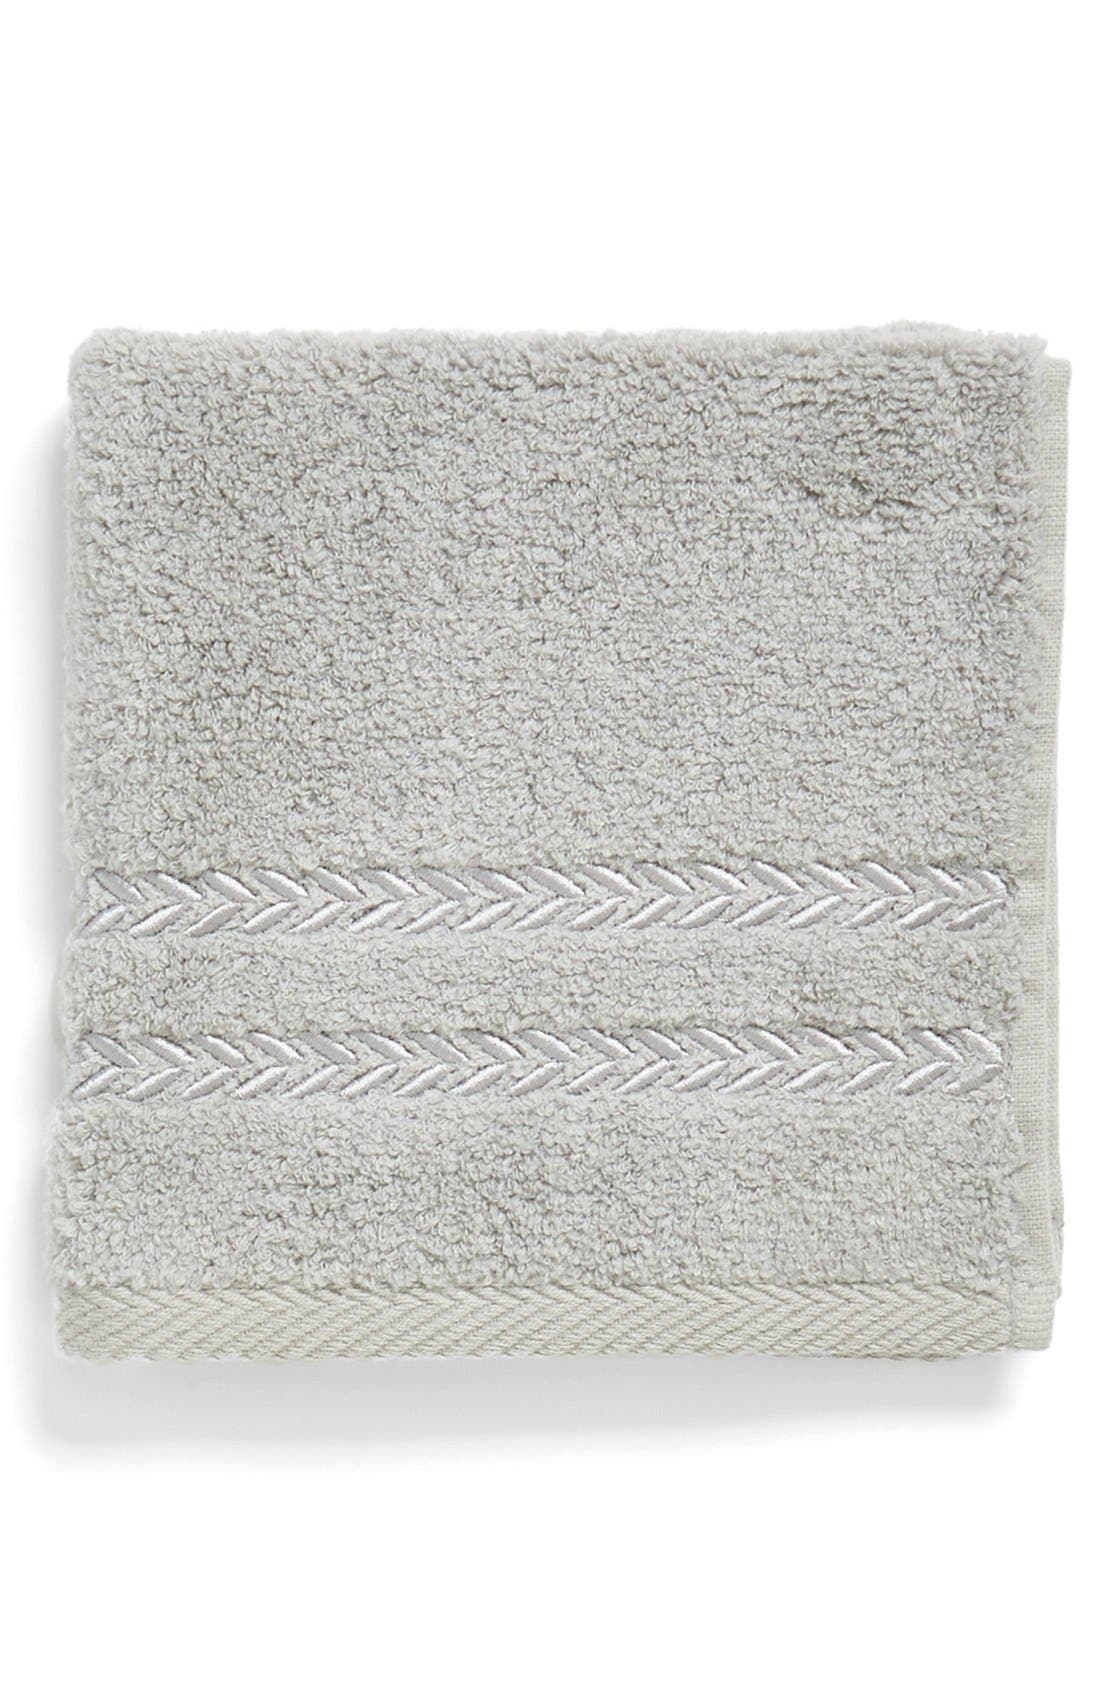 'Pearl Essence' Wash Towel,                         Main,                         color, Smoke